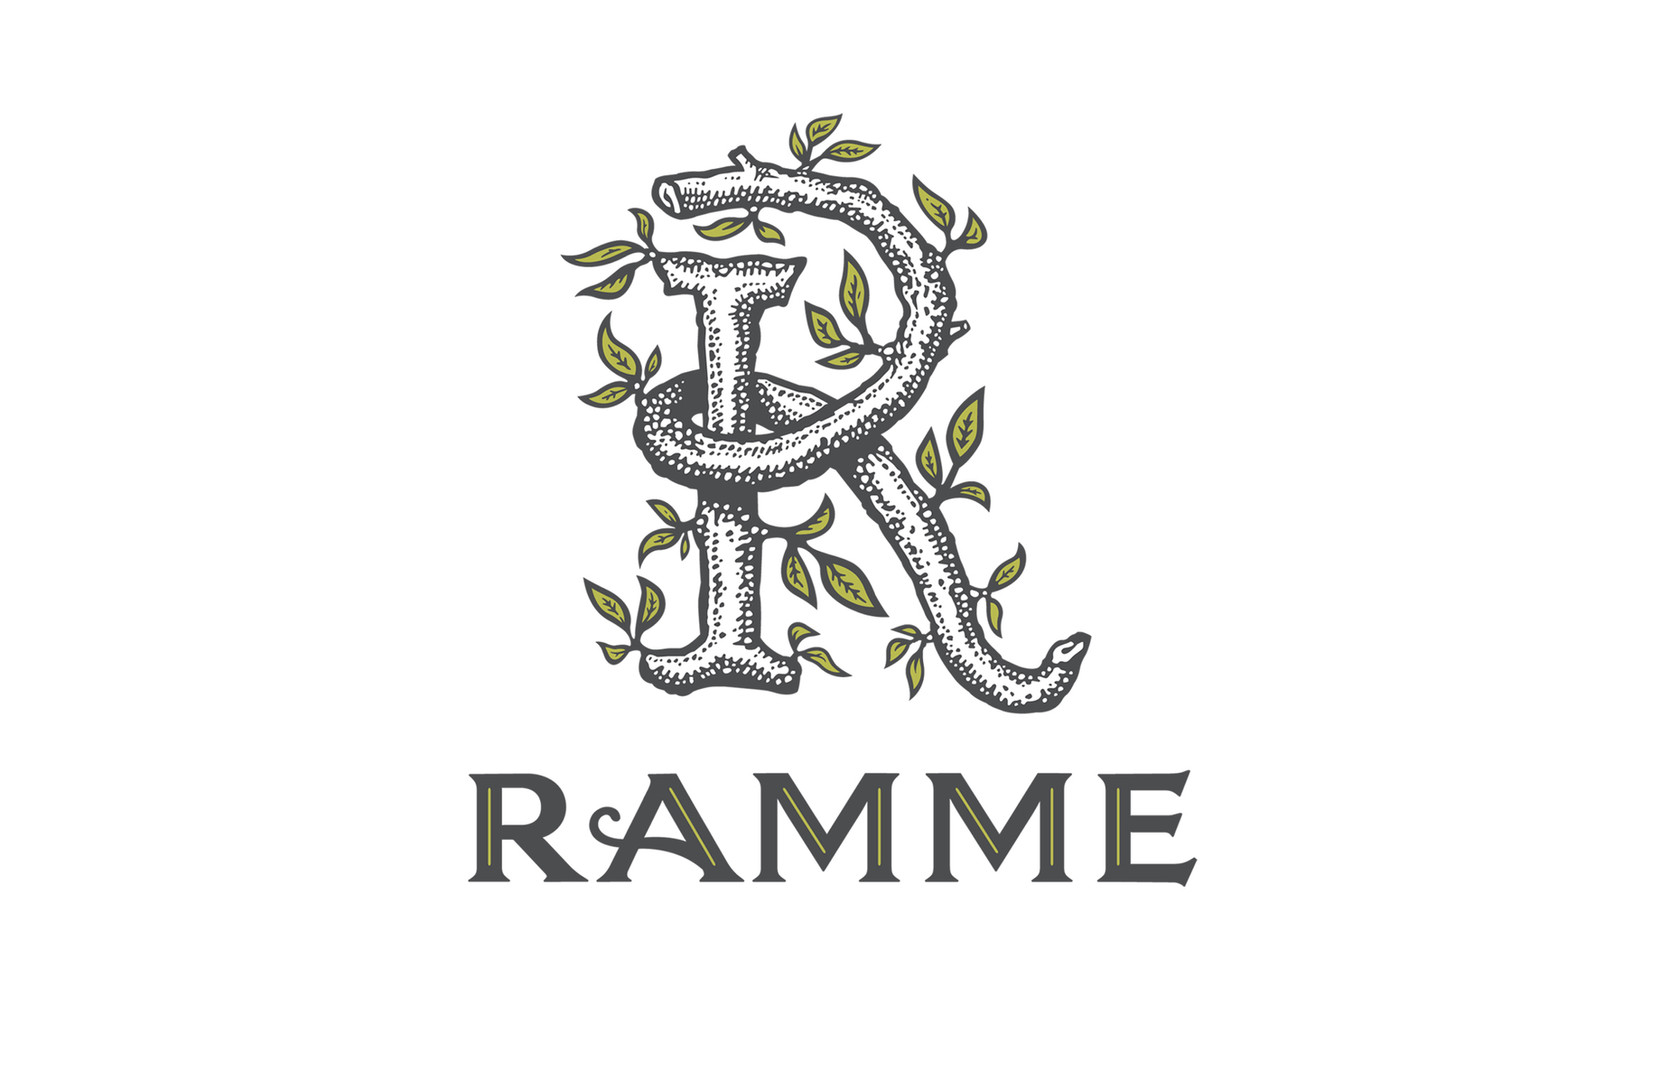 Ramme logo